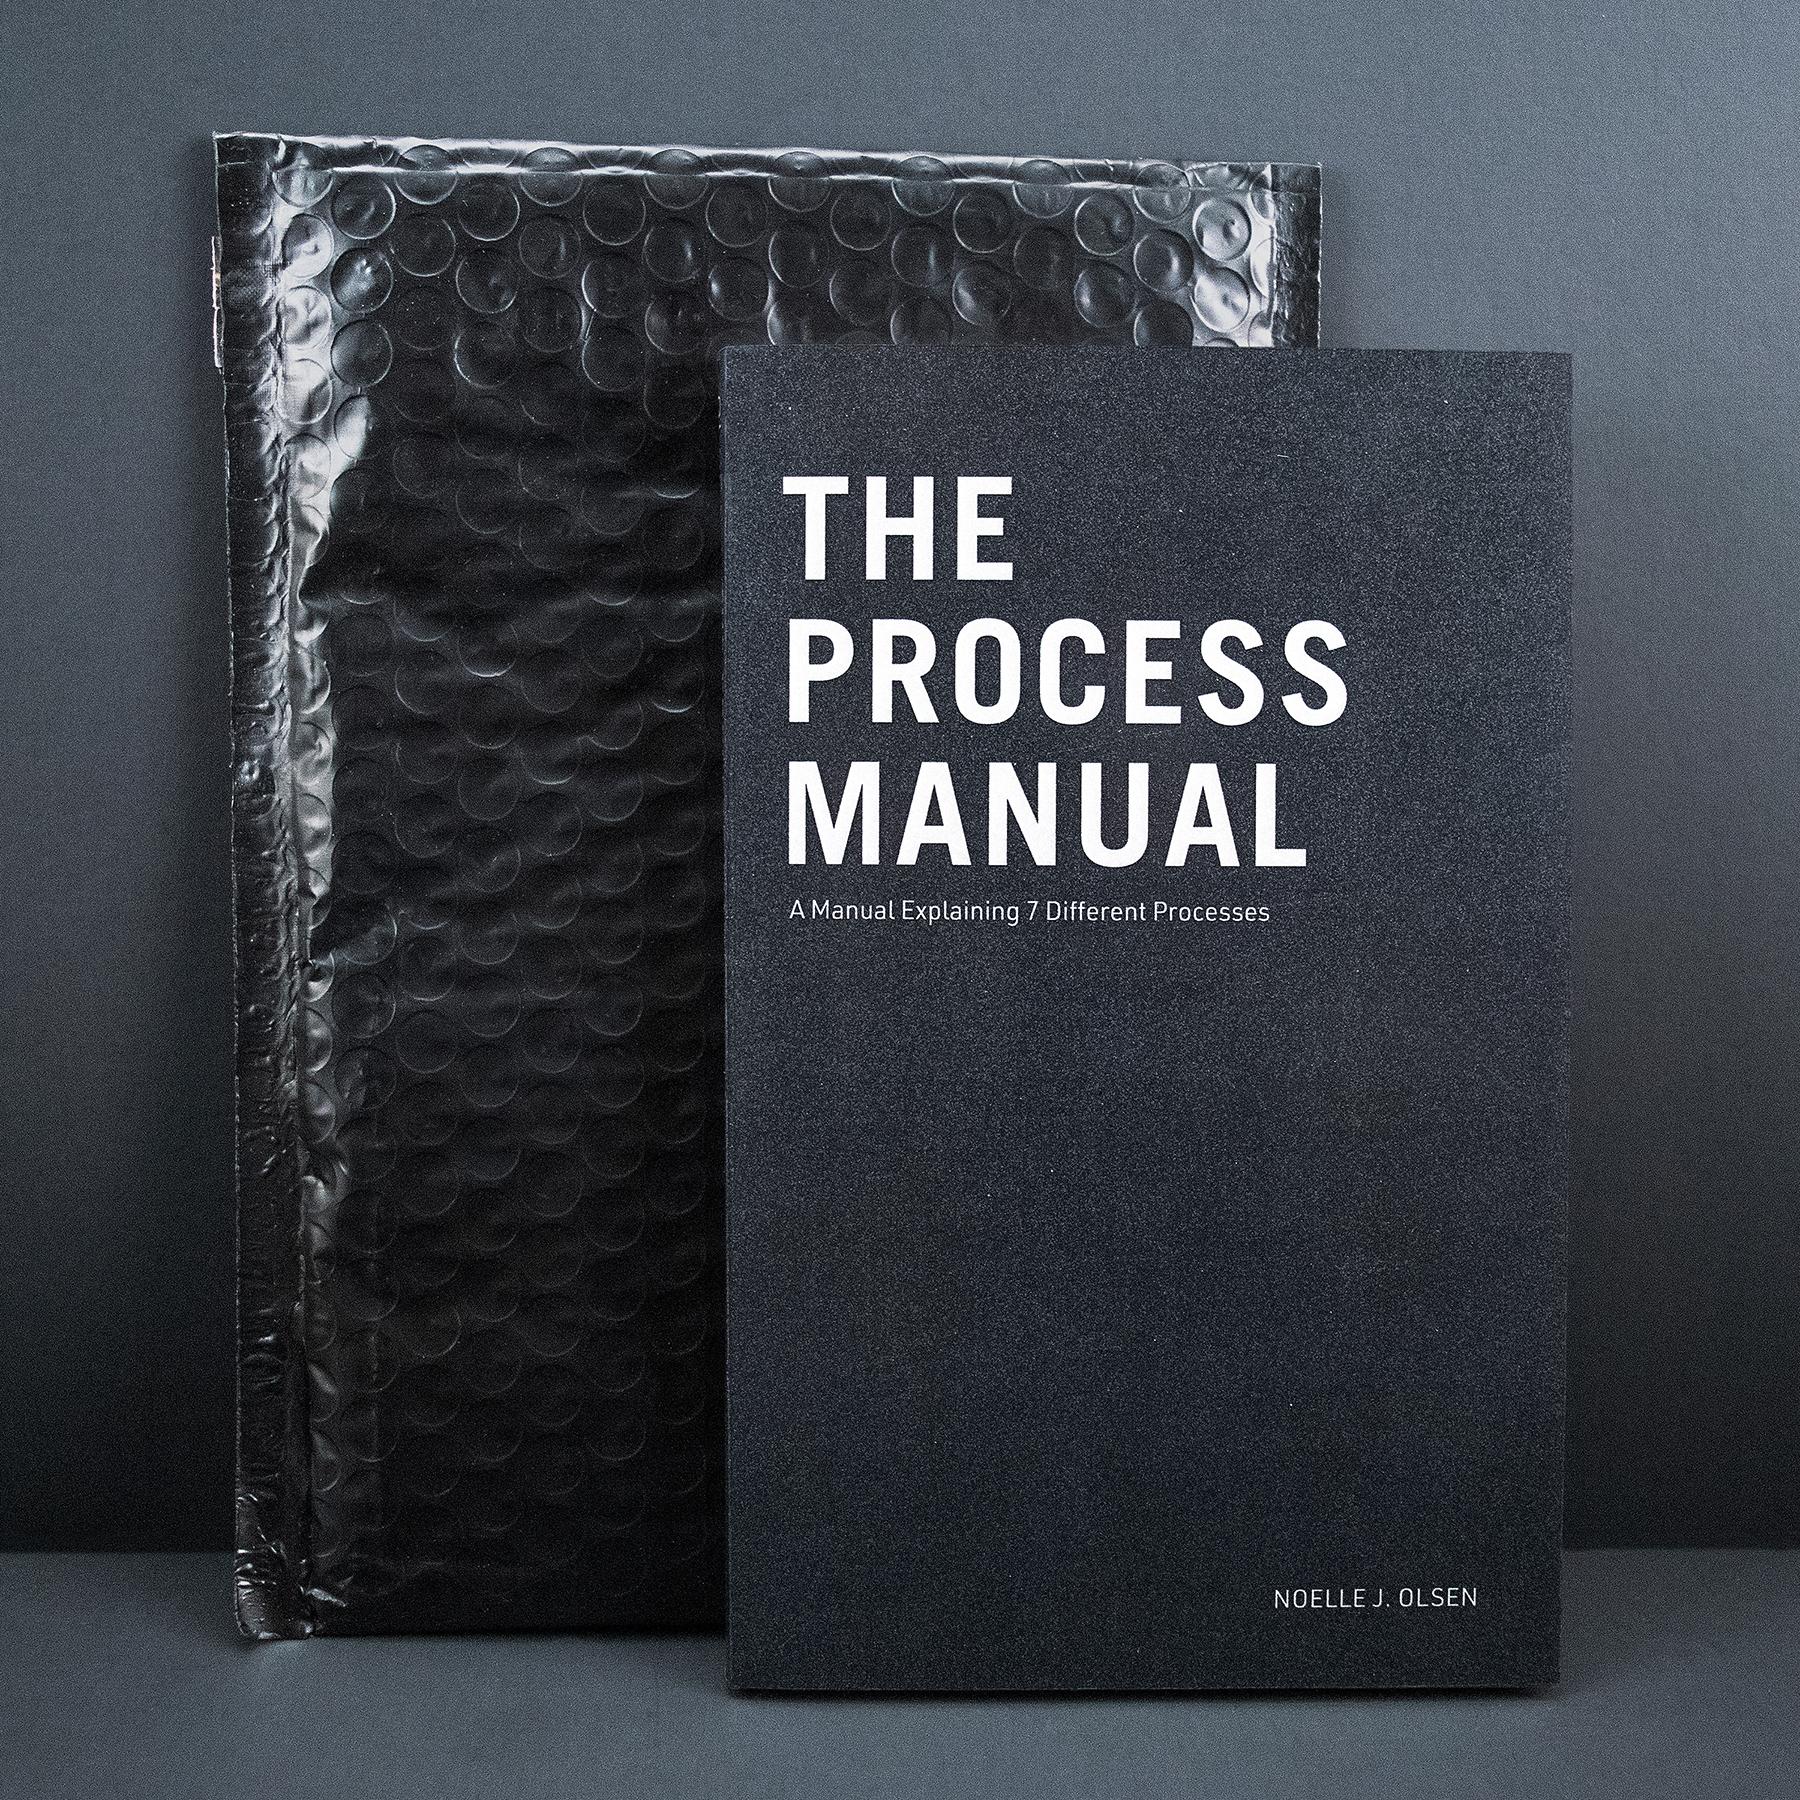 "The Process Manual: A Manuel Explaining 7 Different Processes, Noelle Olsen, 2019, screen print / laser print, 5 x 8"""